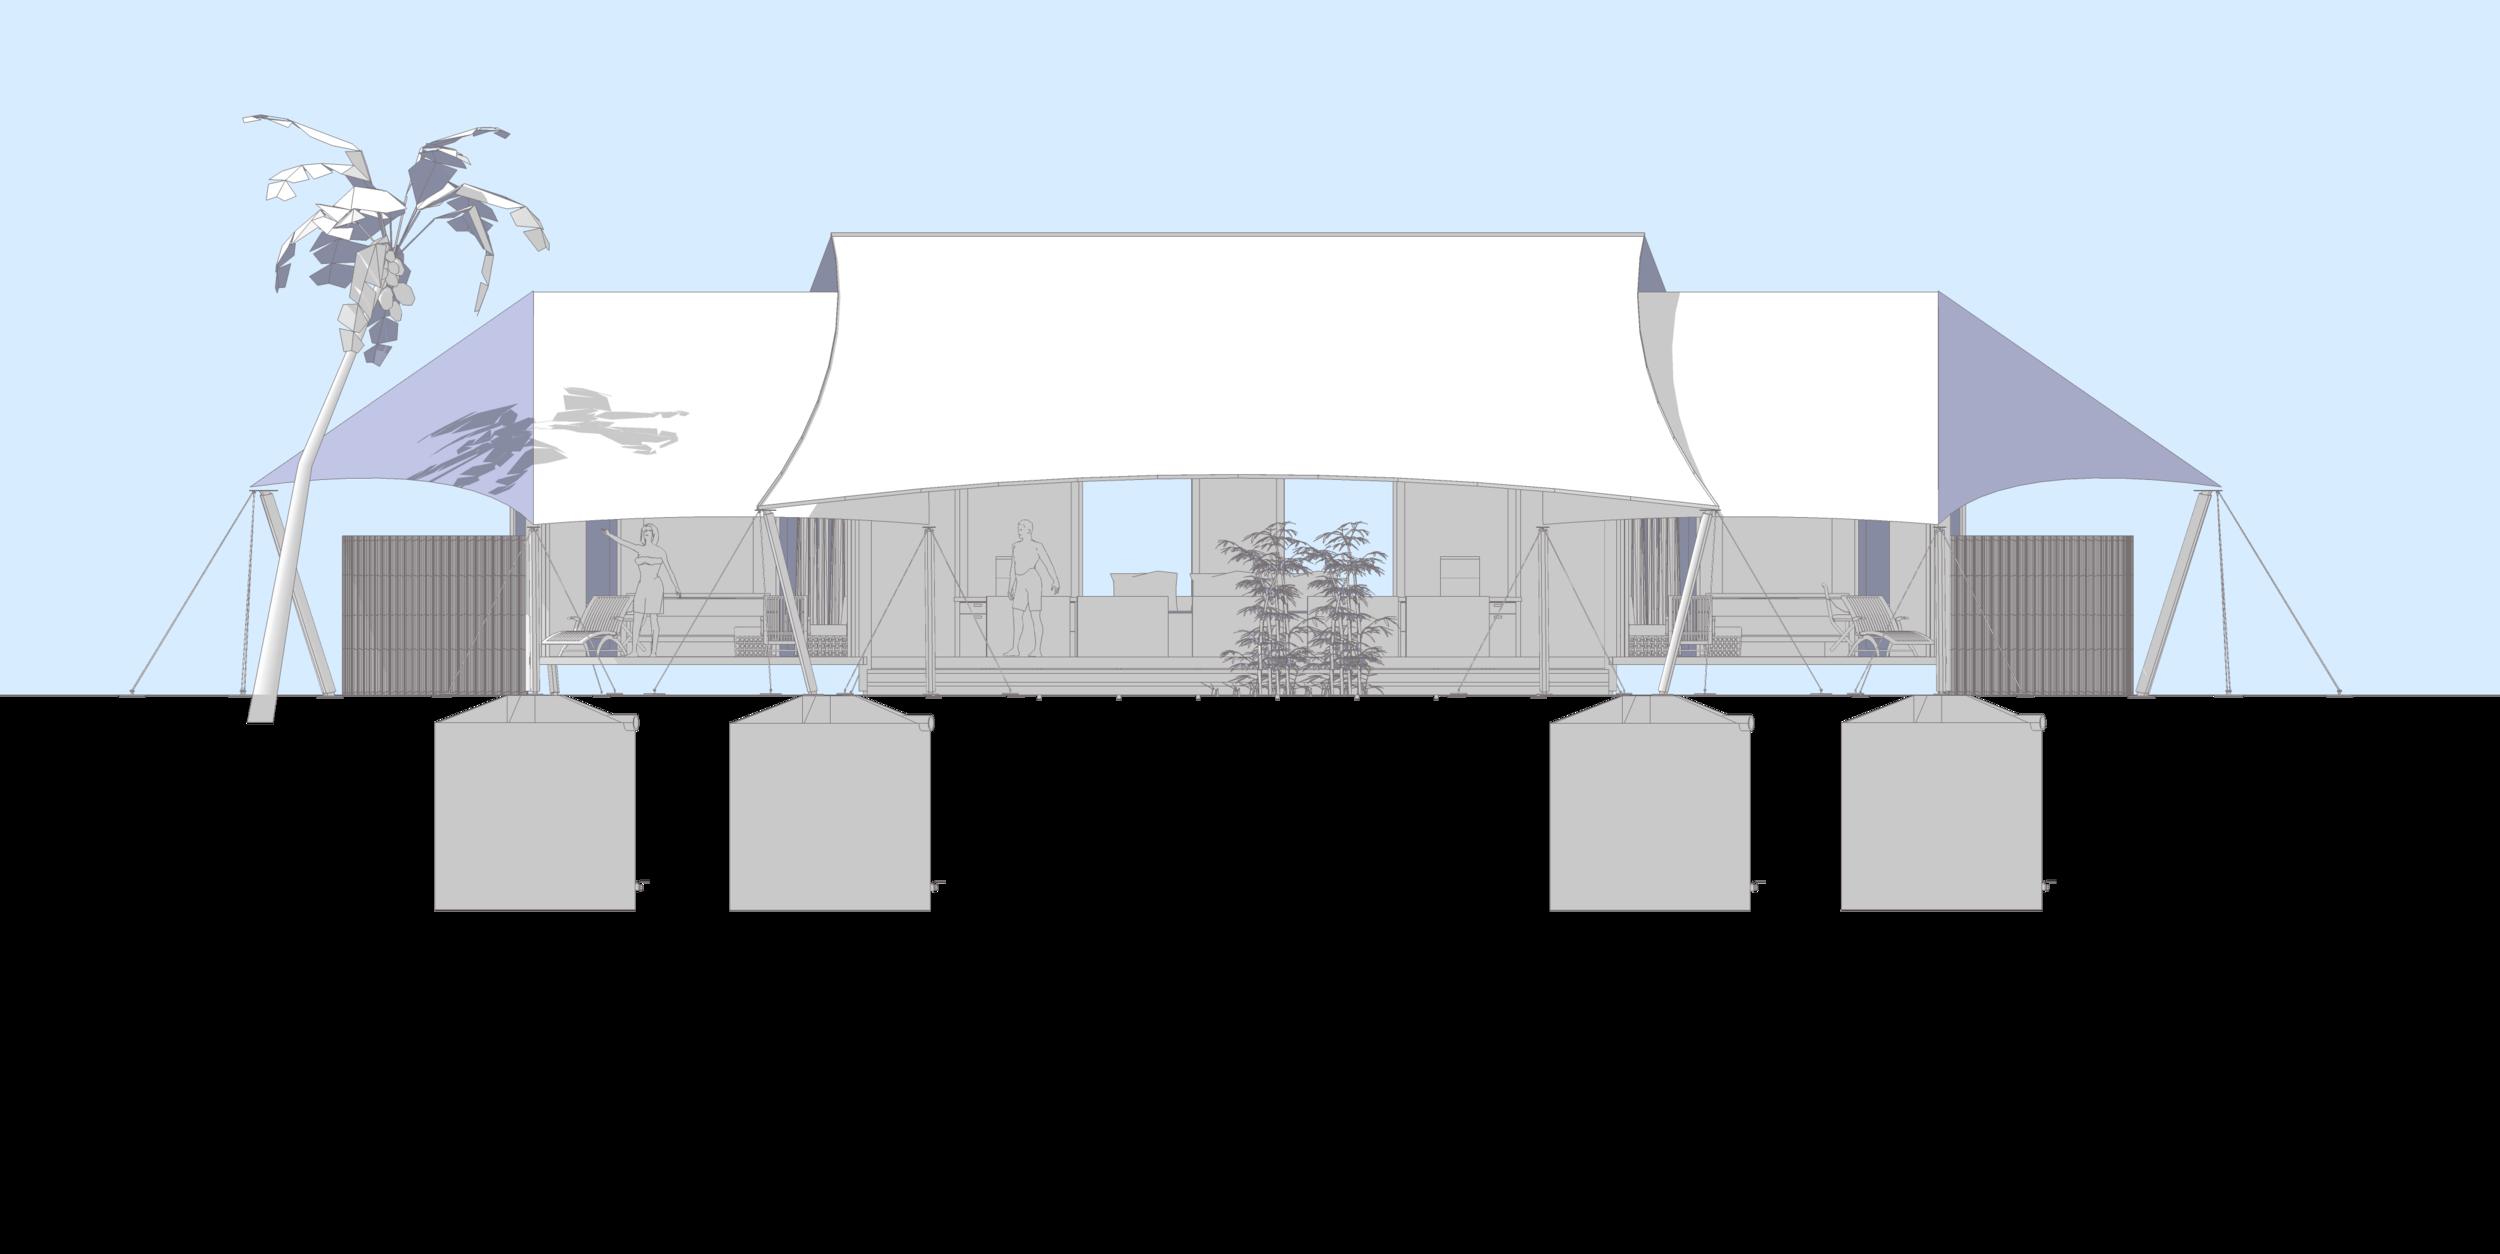 S.E.A.-Studio-Environmental-Architecture-David-Hertz-FAIA-Beran-East-Indies-Trader-Watermans-Resort-Papua-New-Guinea-sustainable-regenerative-restorative-green-design-hospitality-tropical-resort-hotel-biomimetic-tensile-structure-site-render-3.png